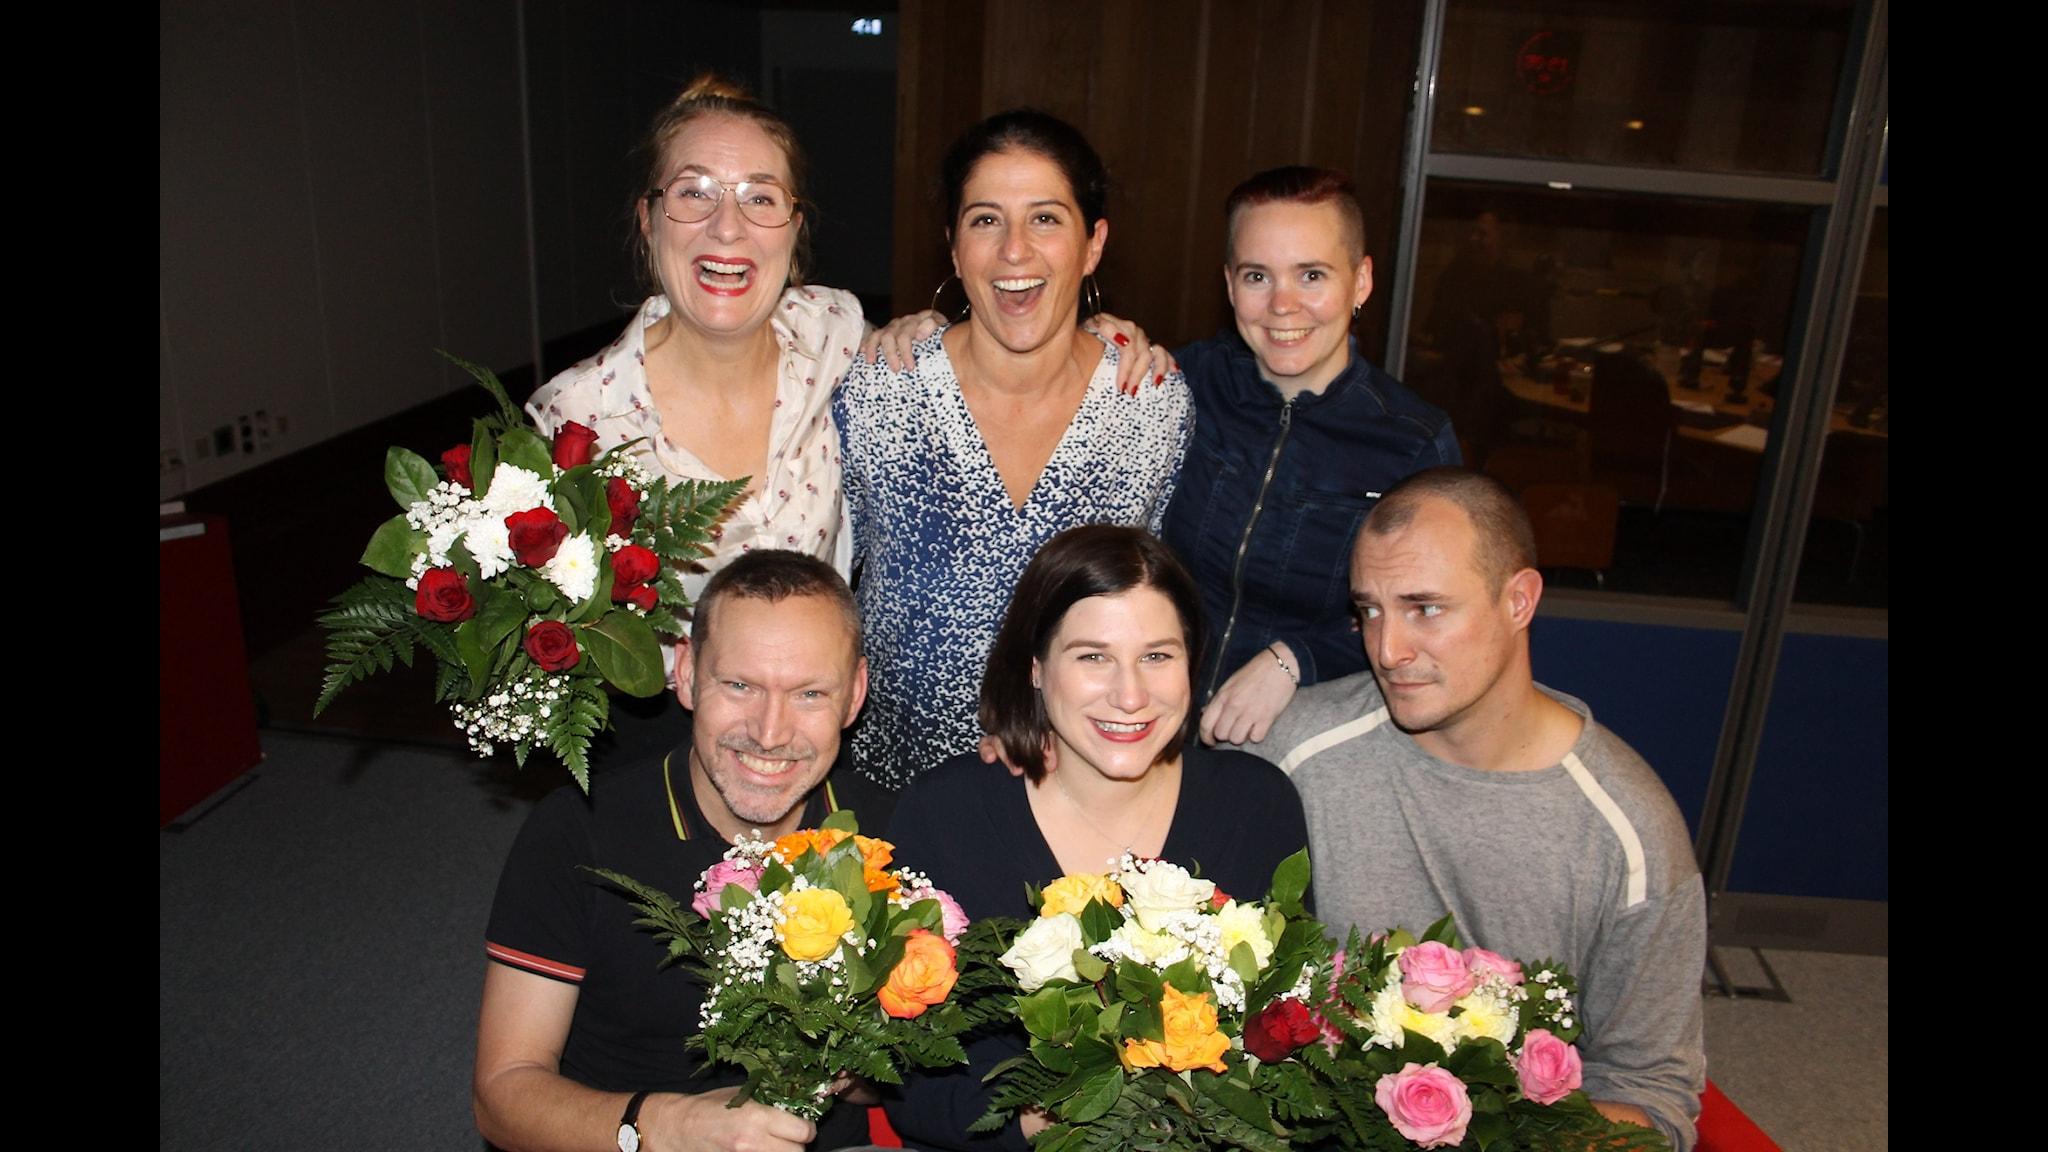 Johan Hilton, Kristin Lundell, Erik Helmerson och Dilsa Demirbag-Sten